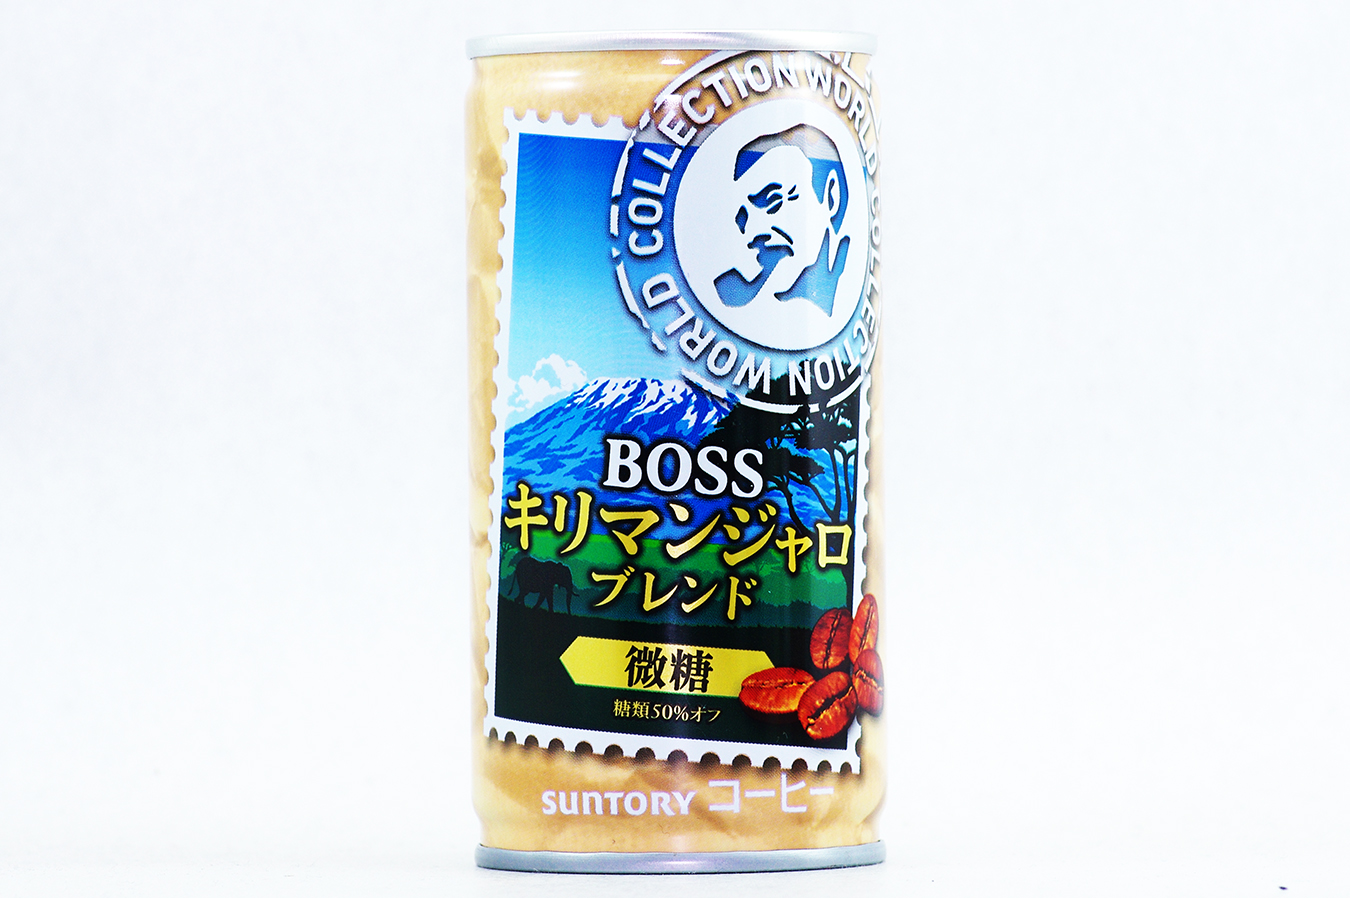 BOSS ワールドコレクション キリマンジャロブレンド微糖 2018年1月